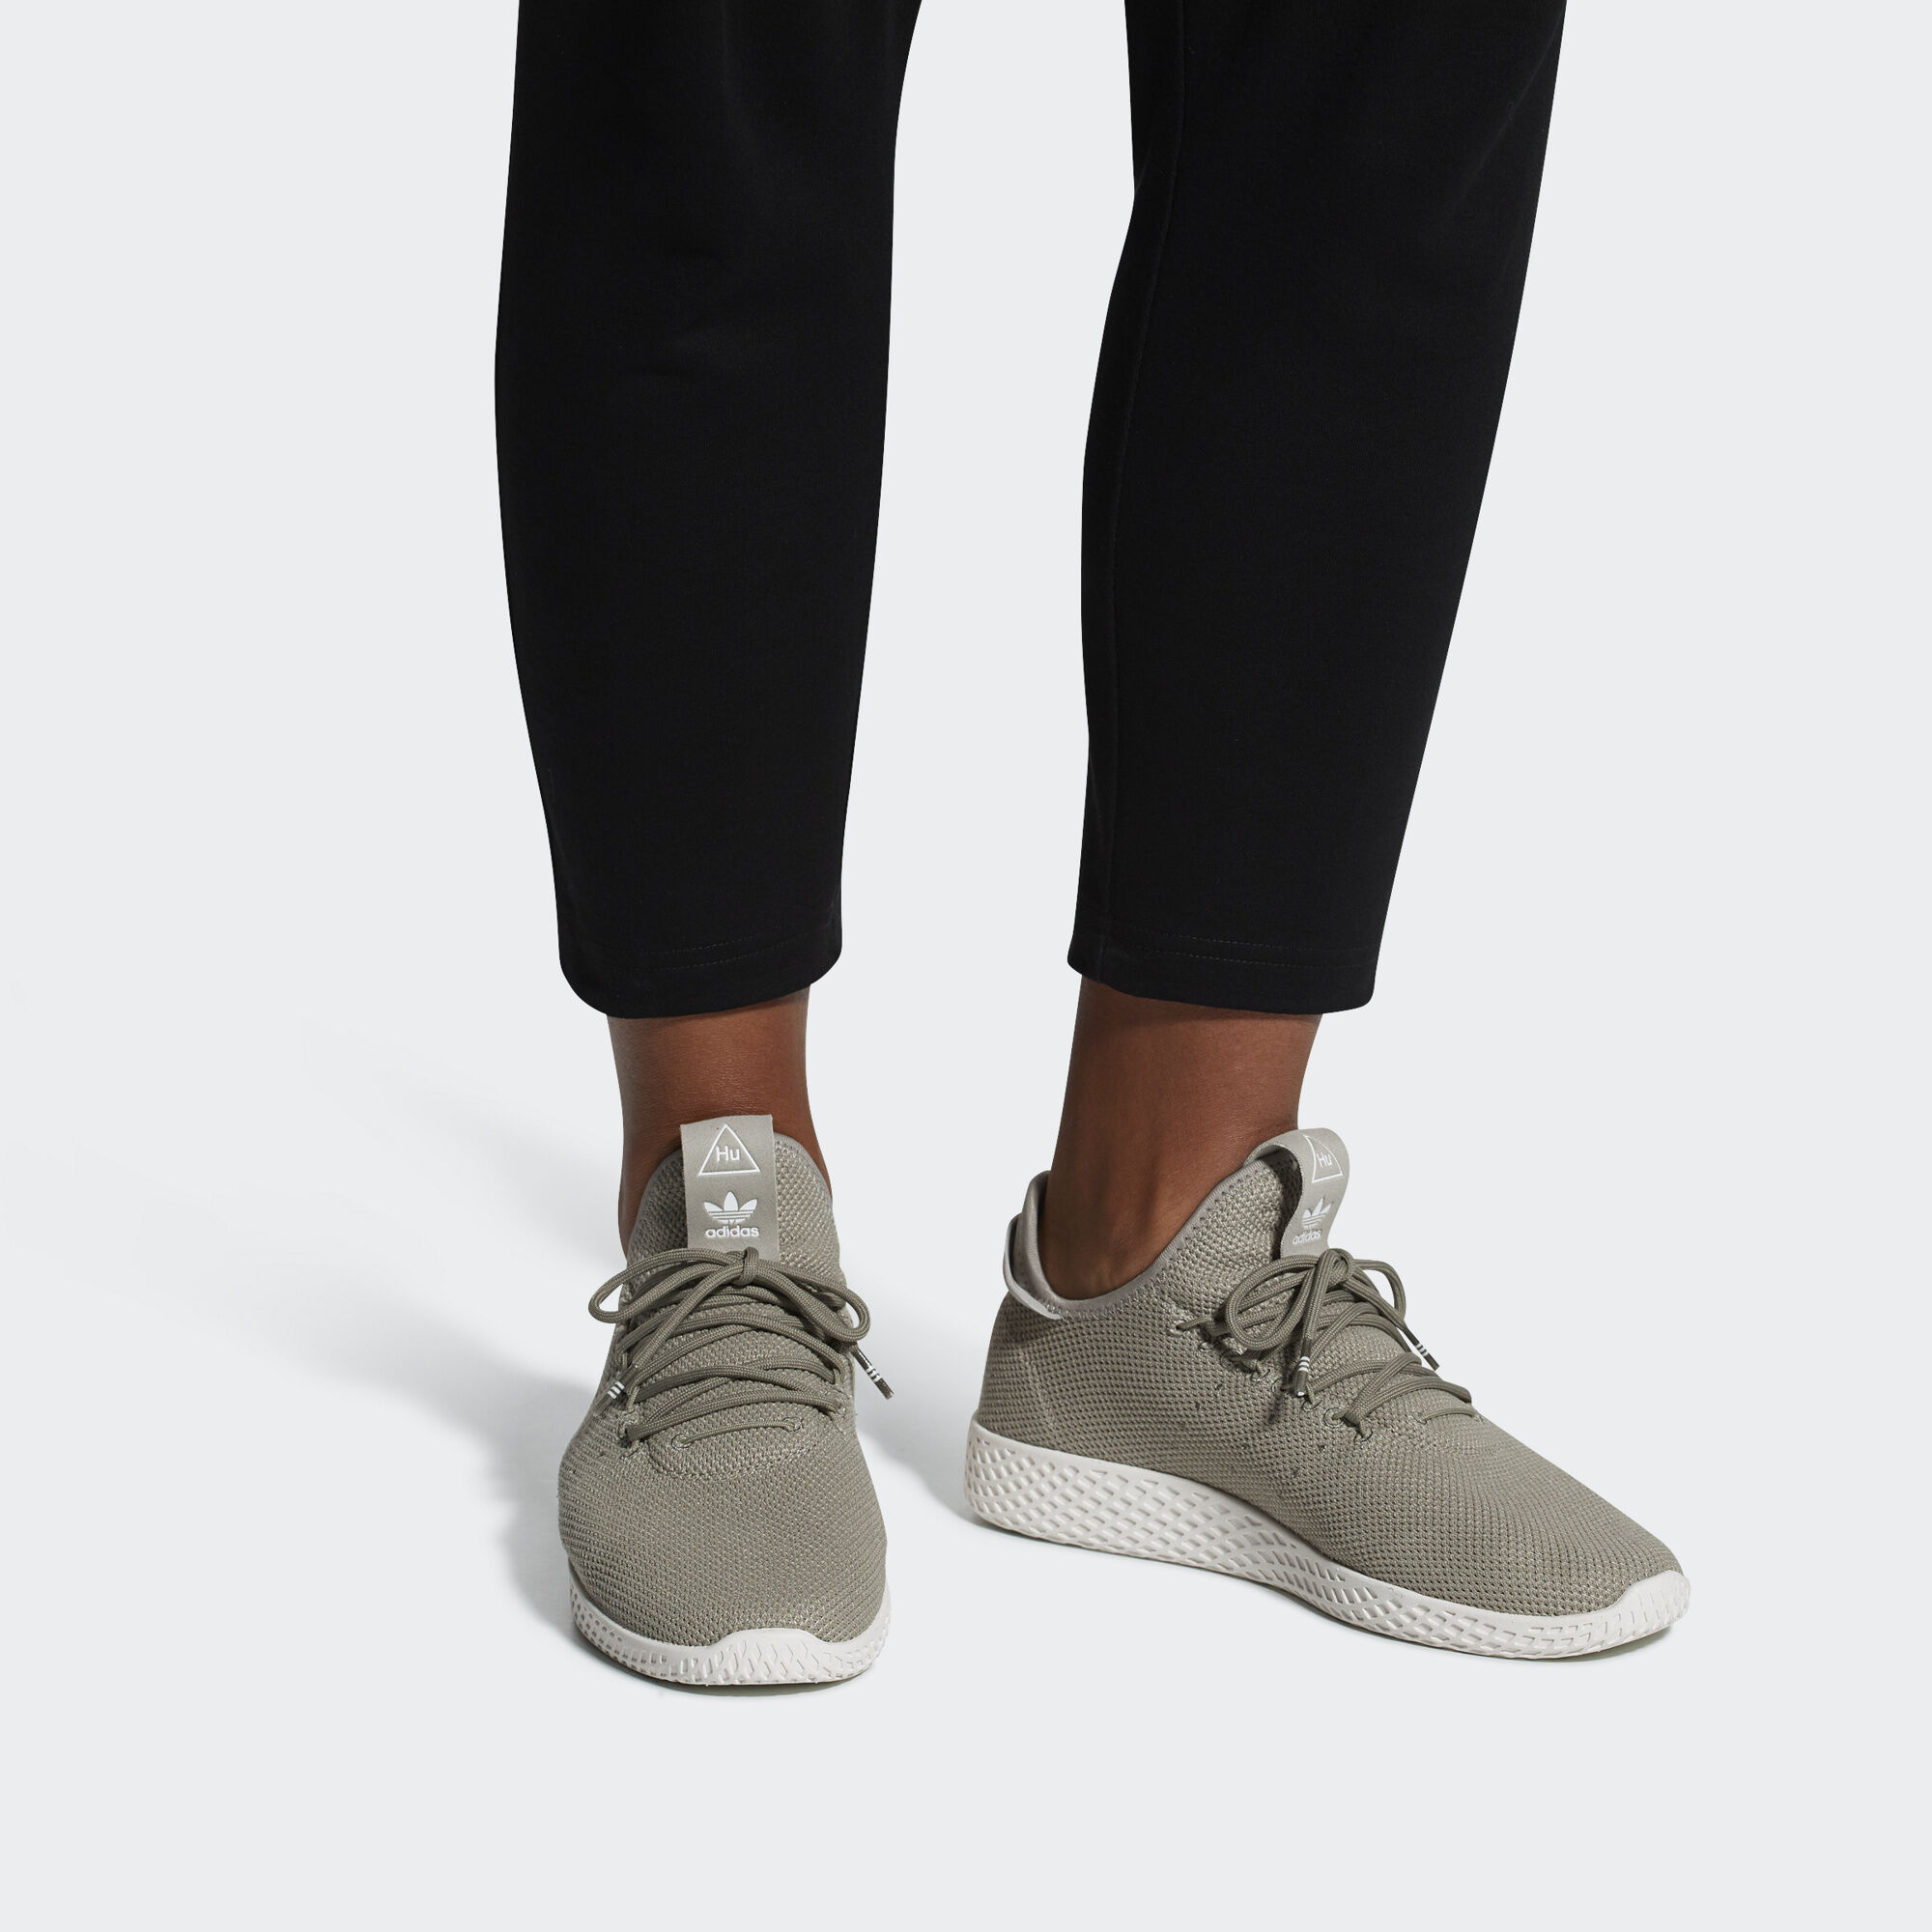 adidas Pharrell Williams Tennis Hu Shoes - White  014c76f03